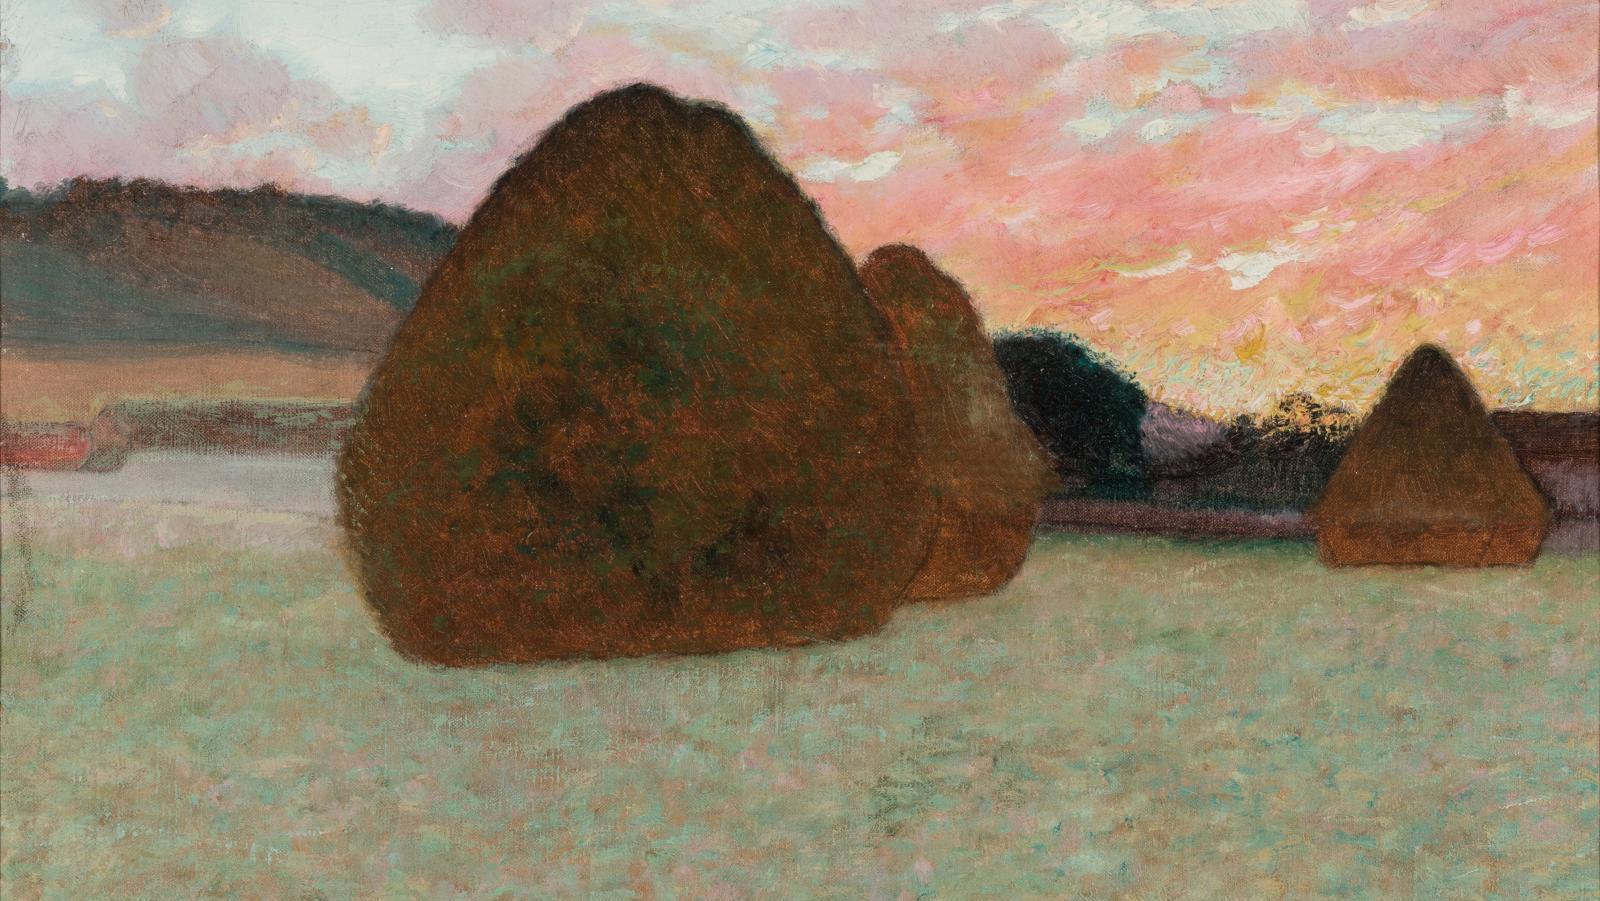 La Peinture Americaine De La Collection Terra A Giverny